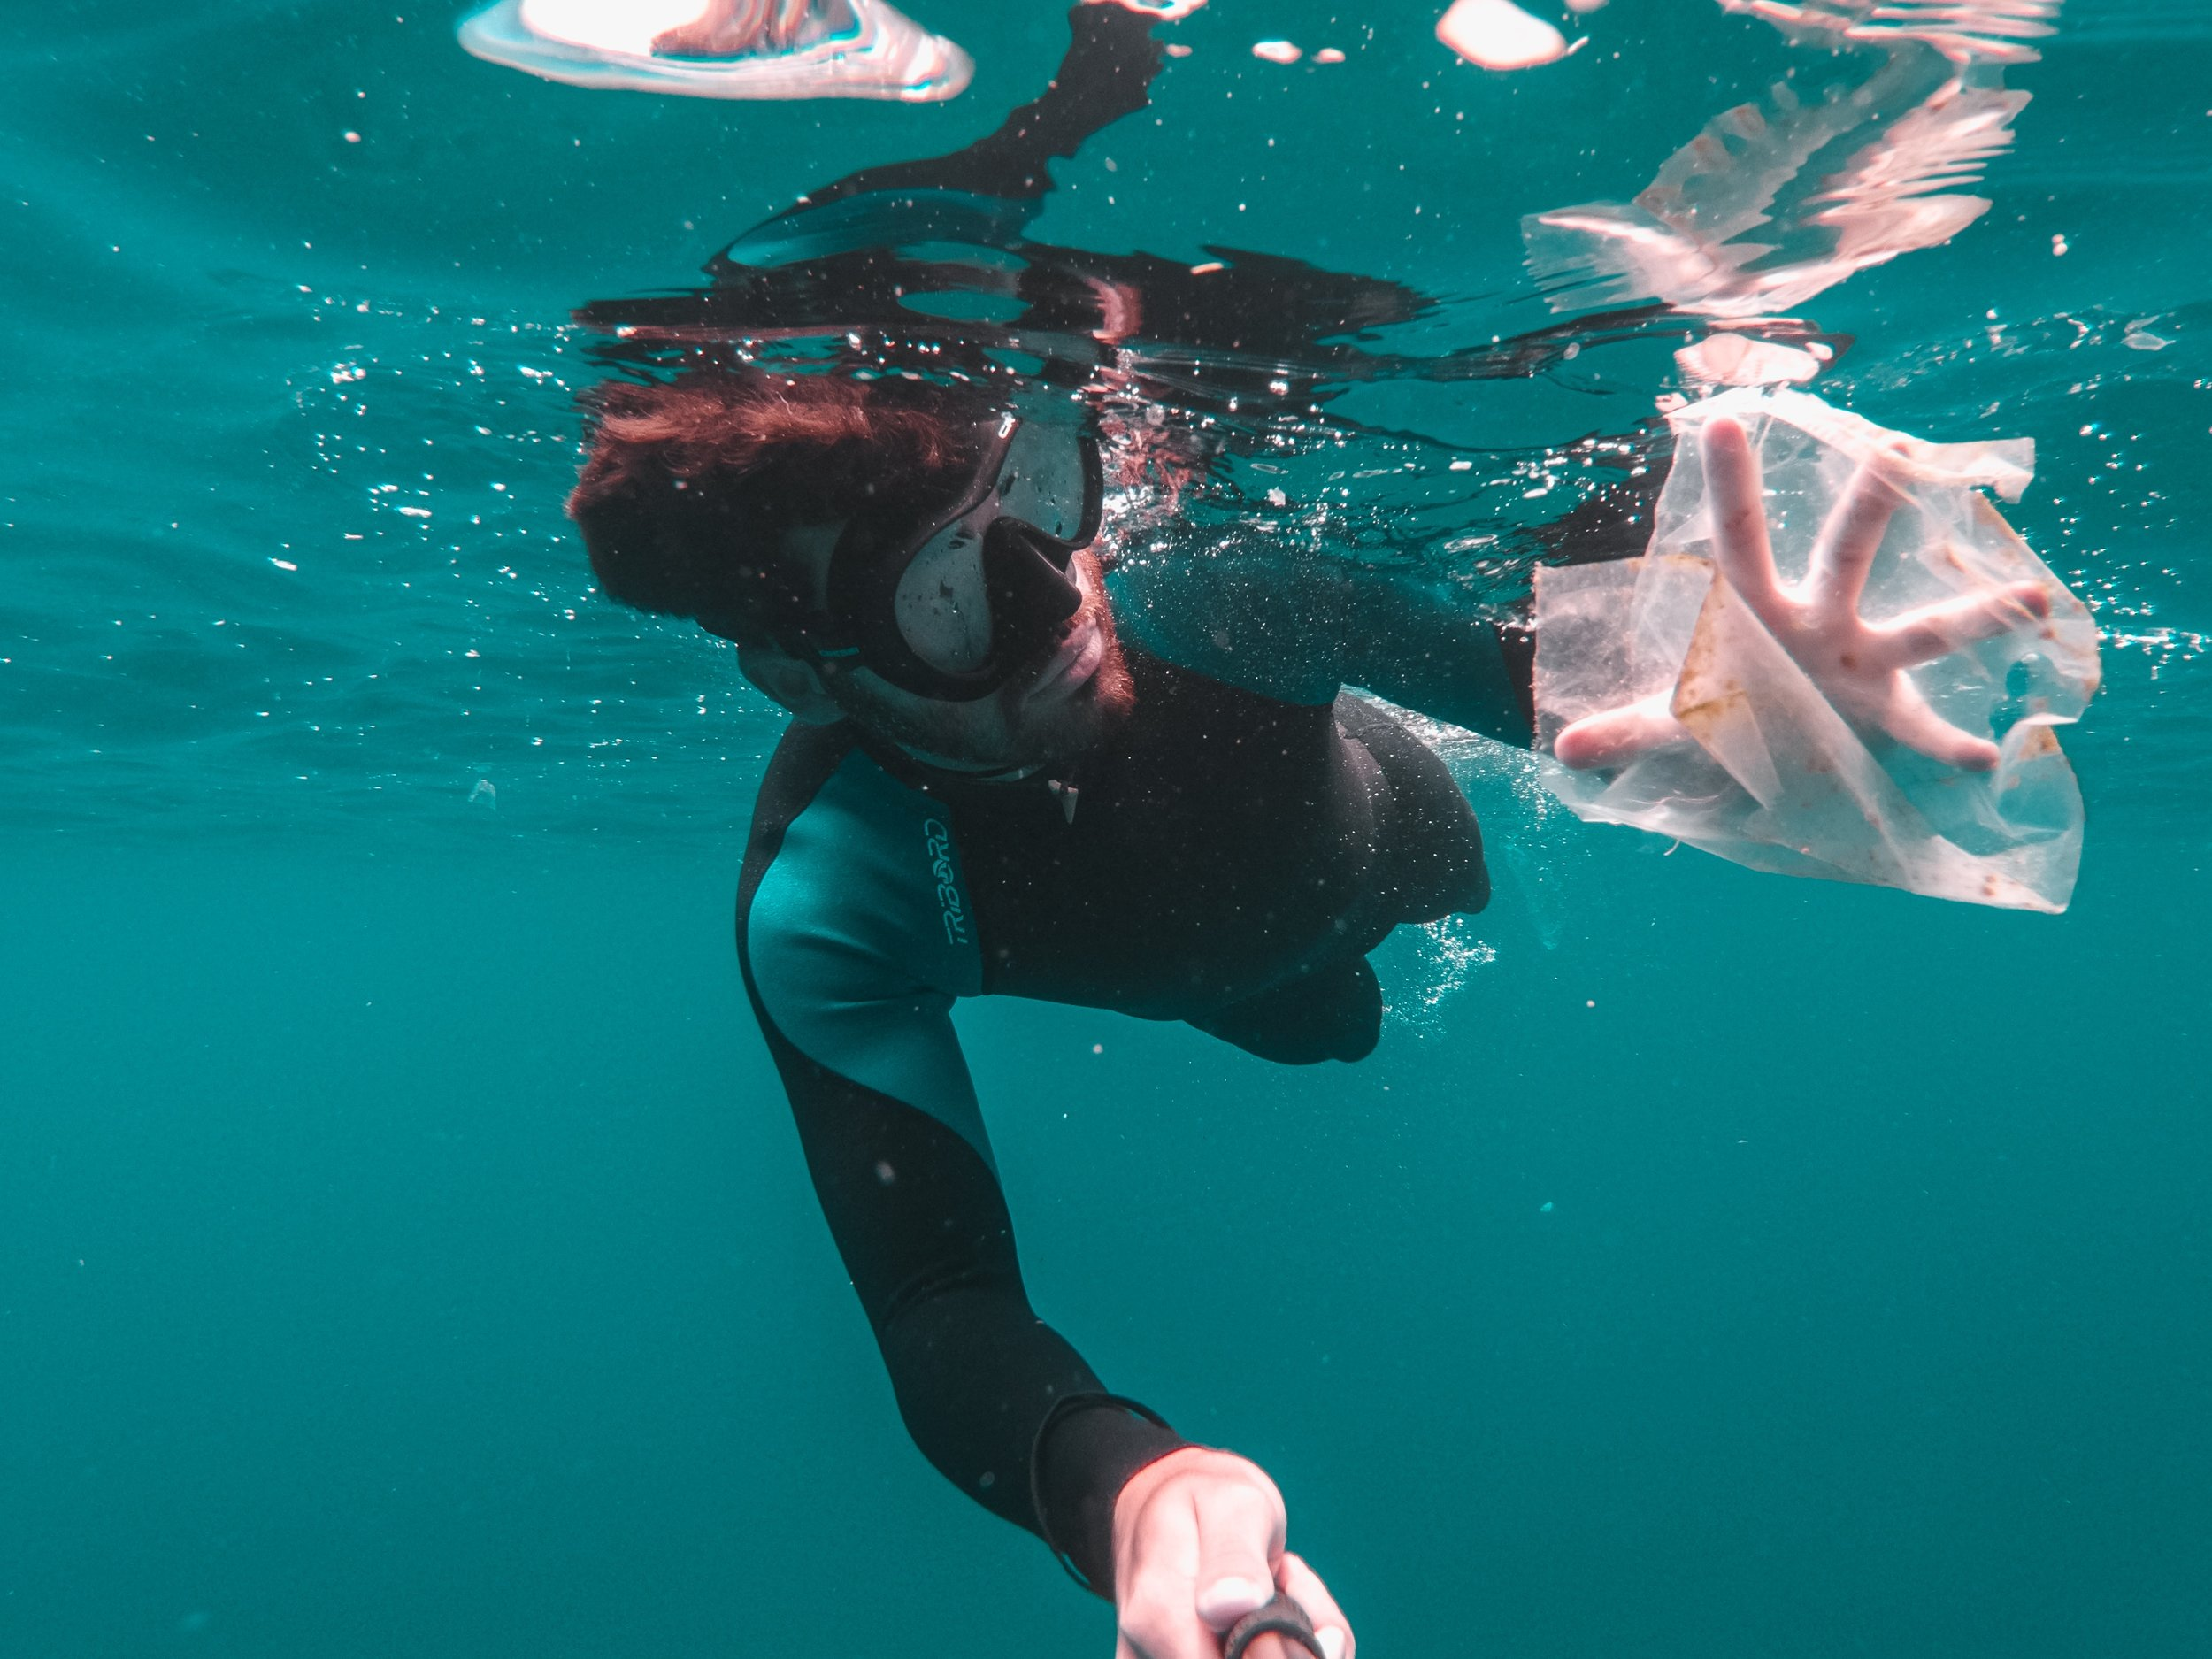 snorkeler grabbing plastic bag in the water